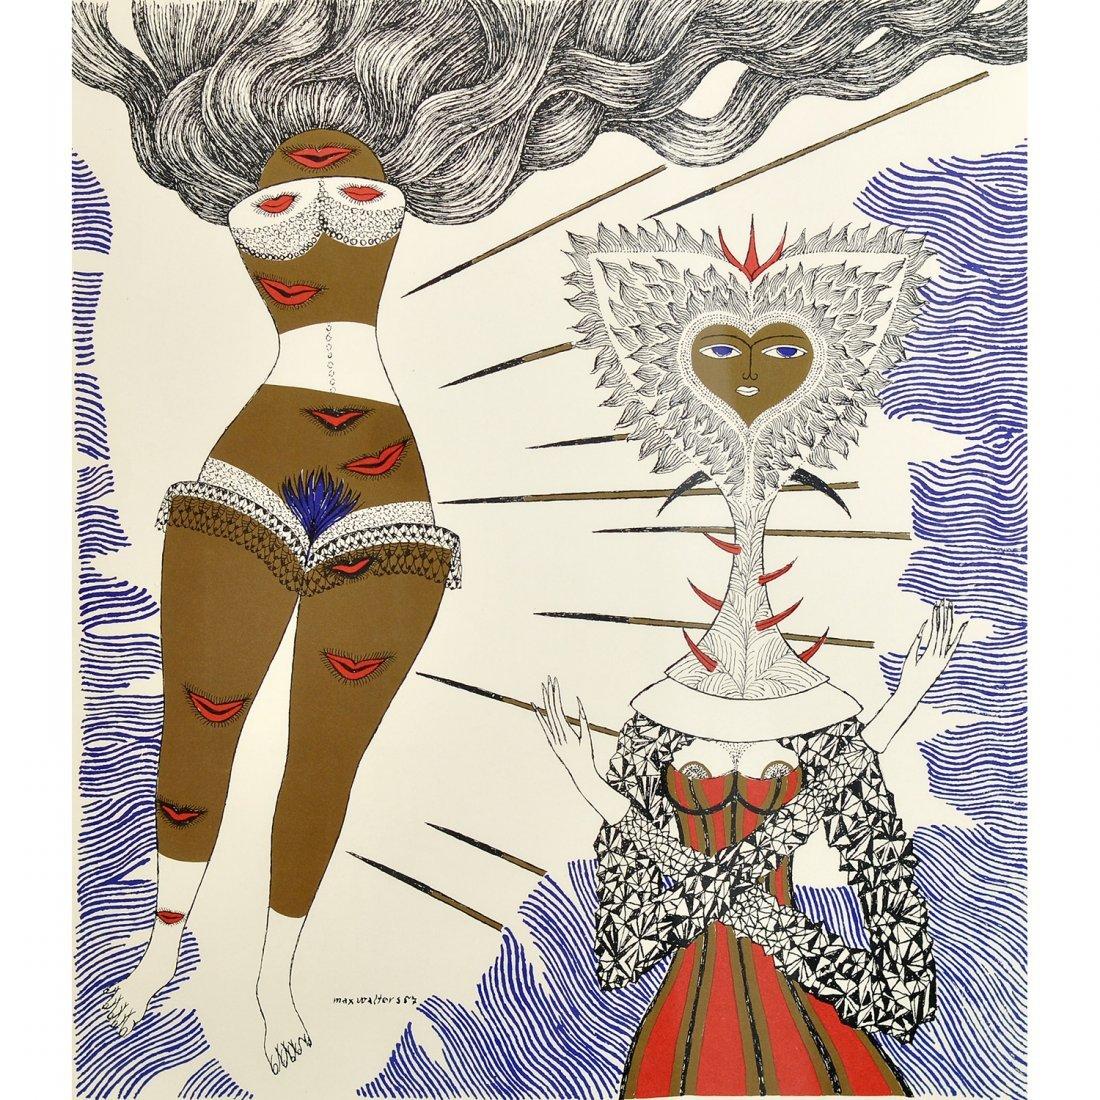 18: MAX WALTER SVANBERG (1912-1994), litografi